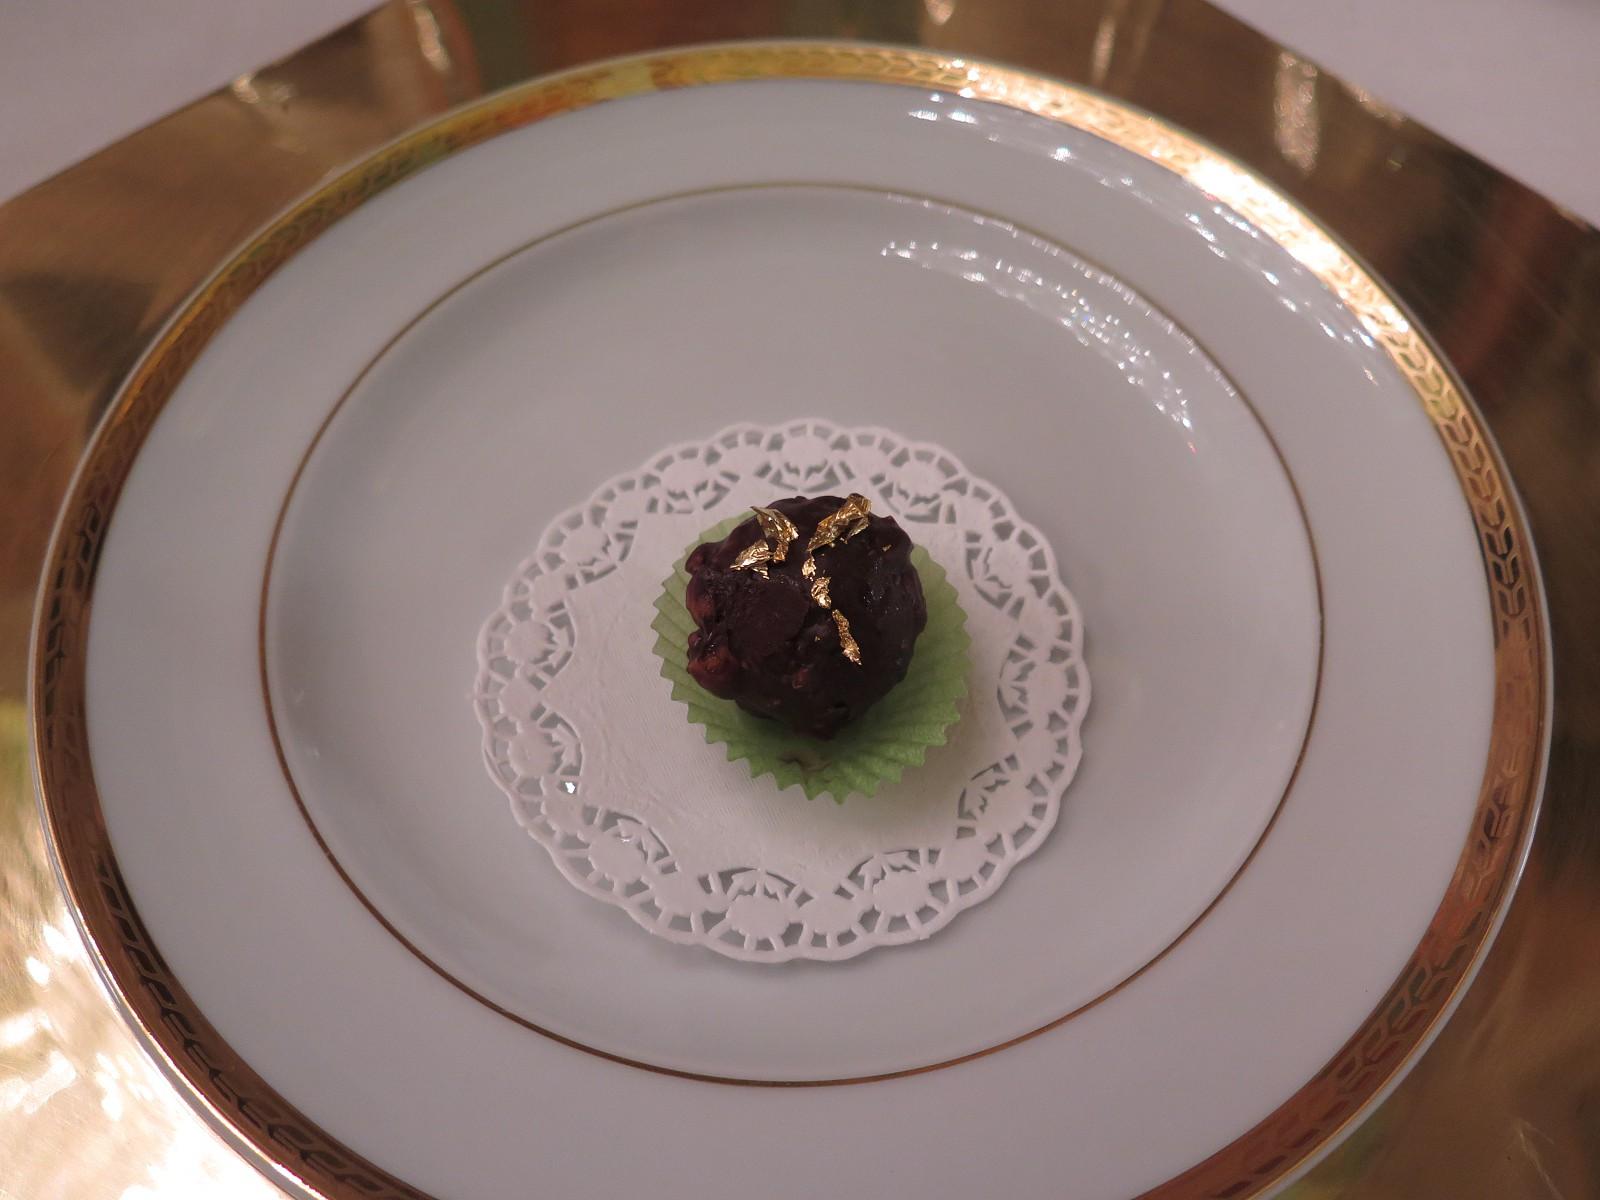 Ferrero Rocher de foie gras